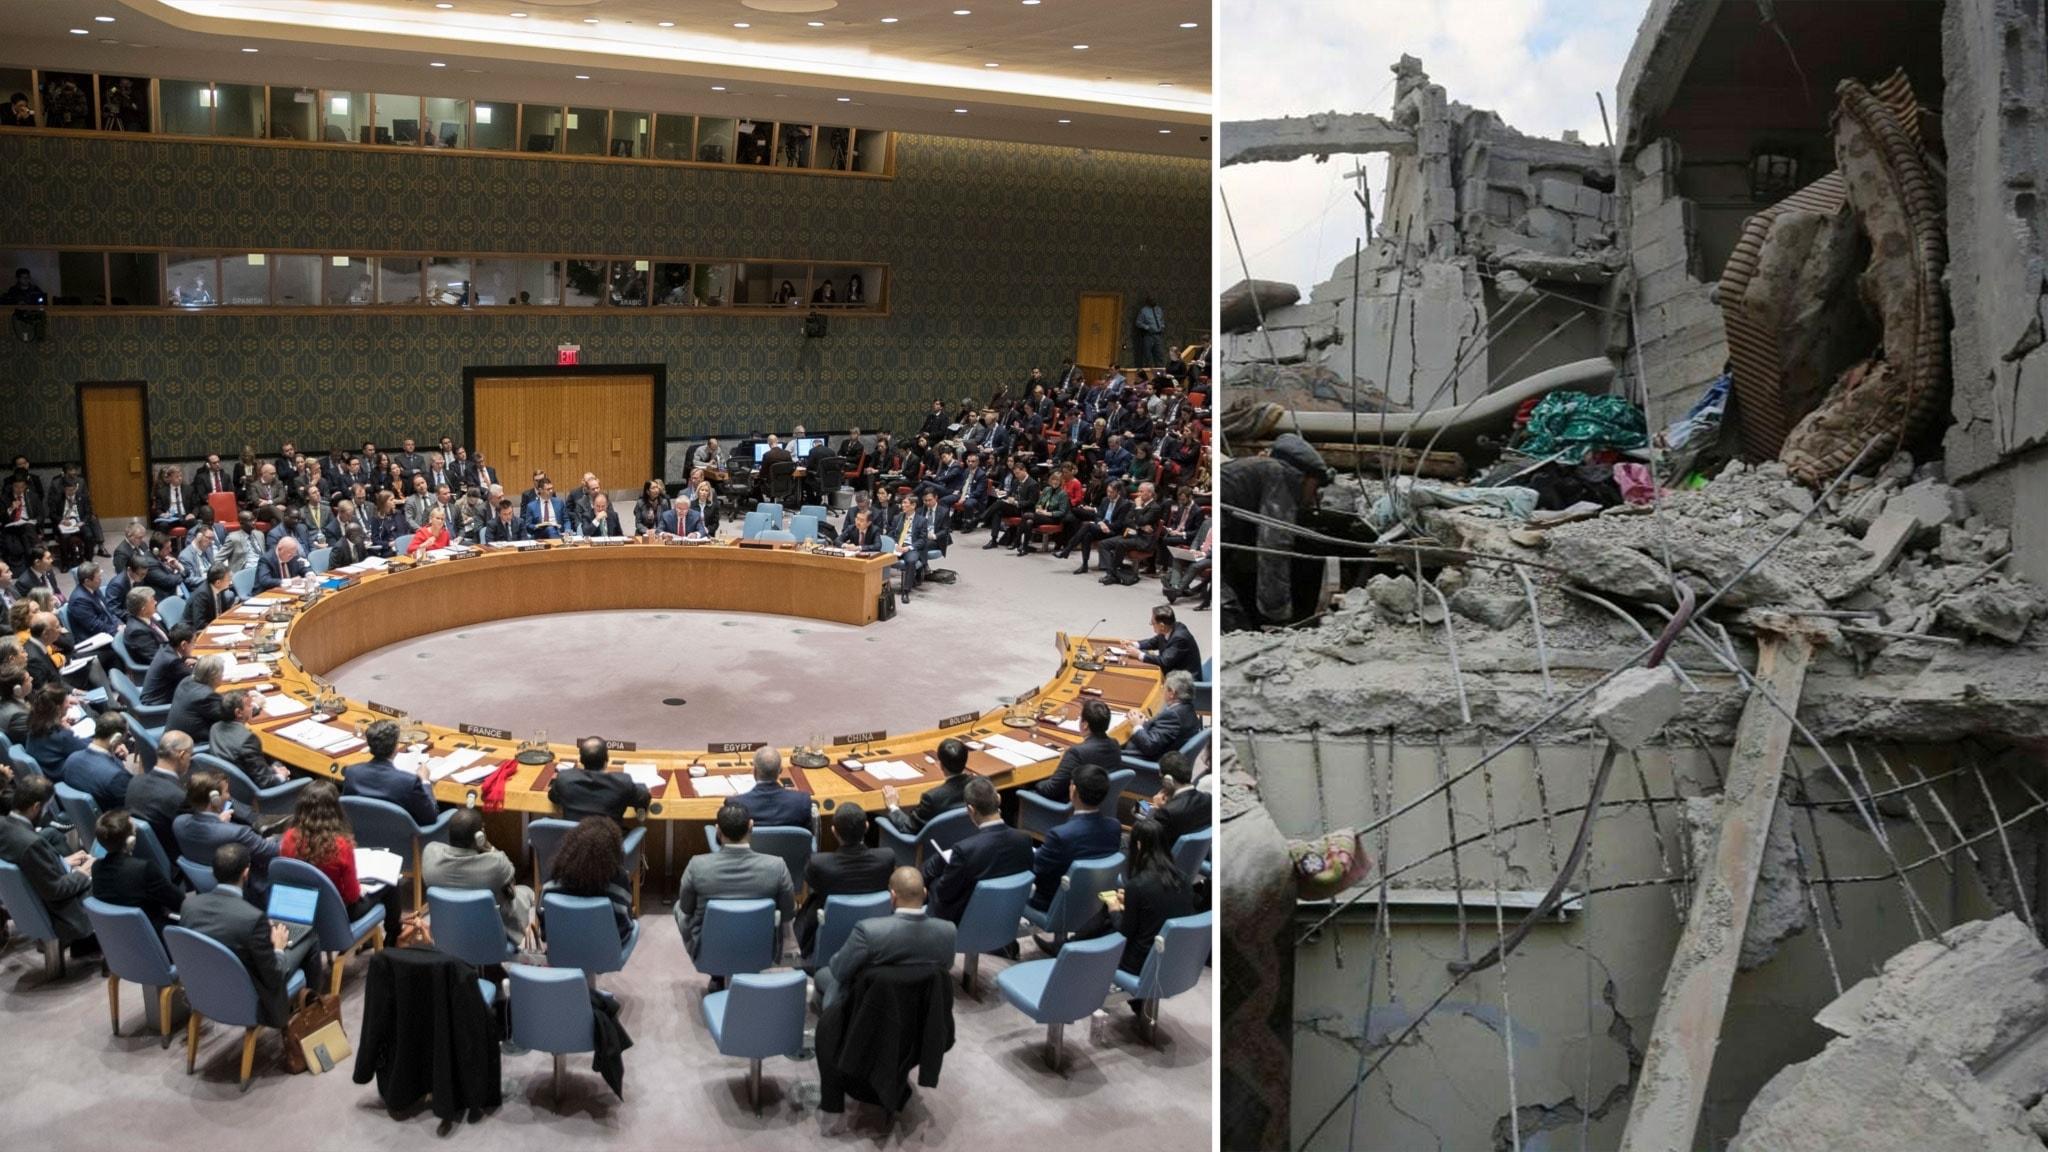 Ryssland eldupphor i syrien orealistiskt